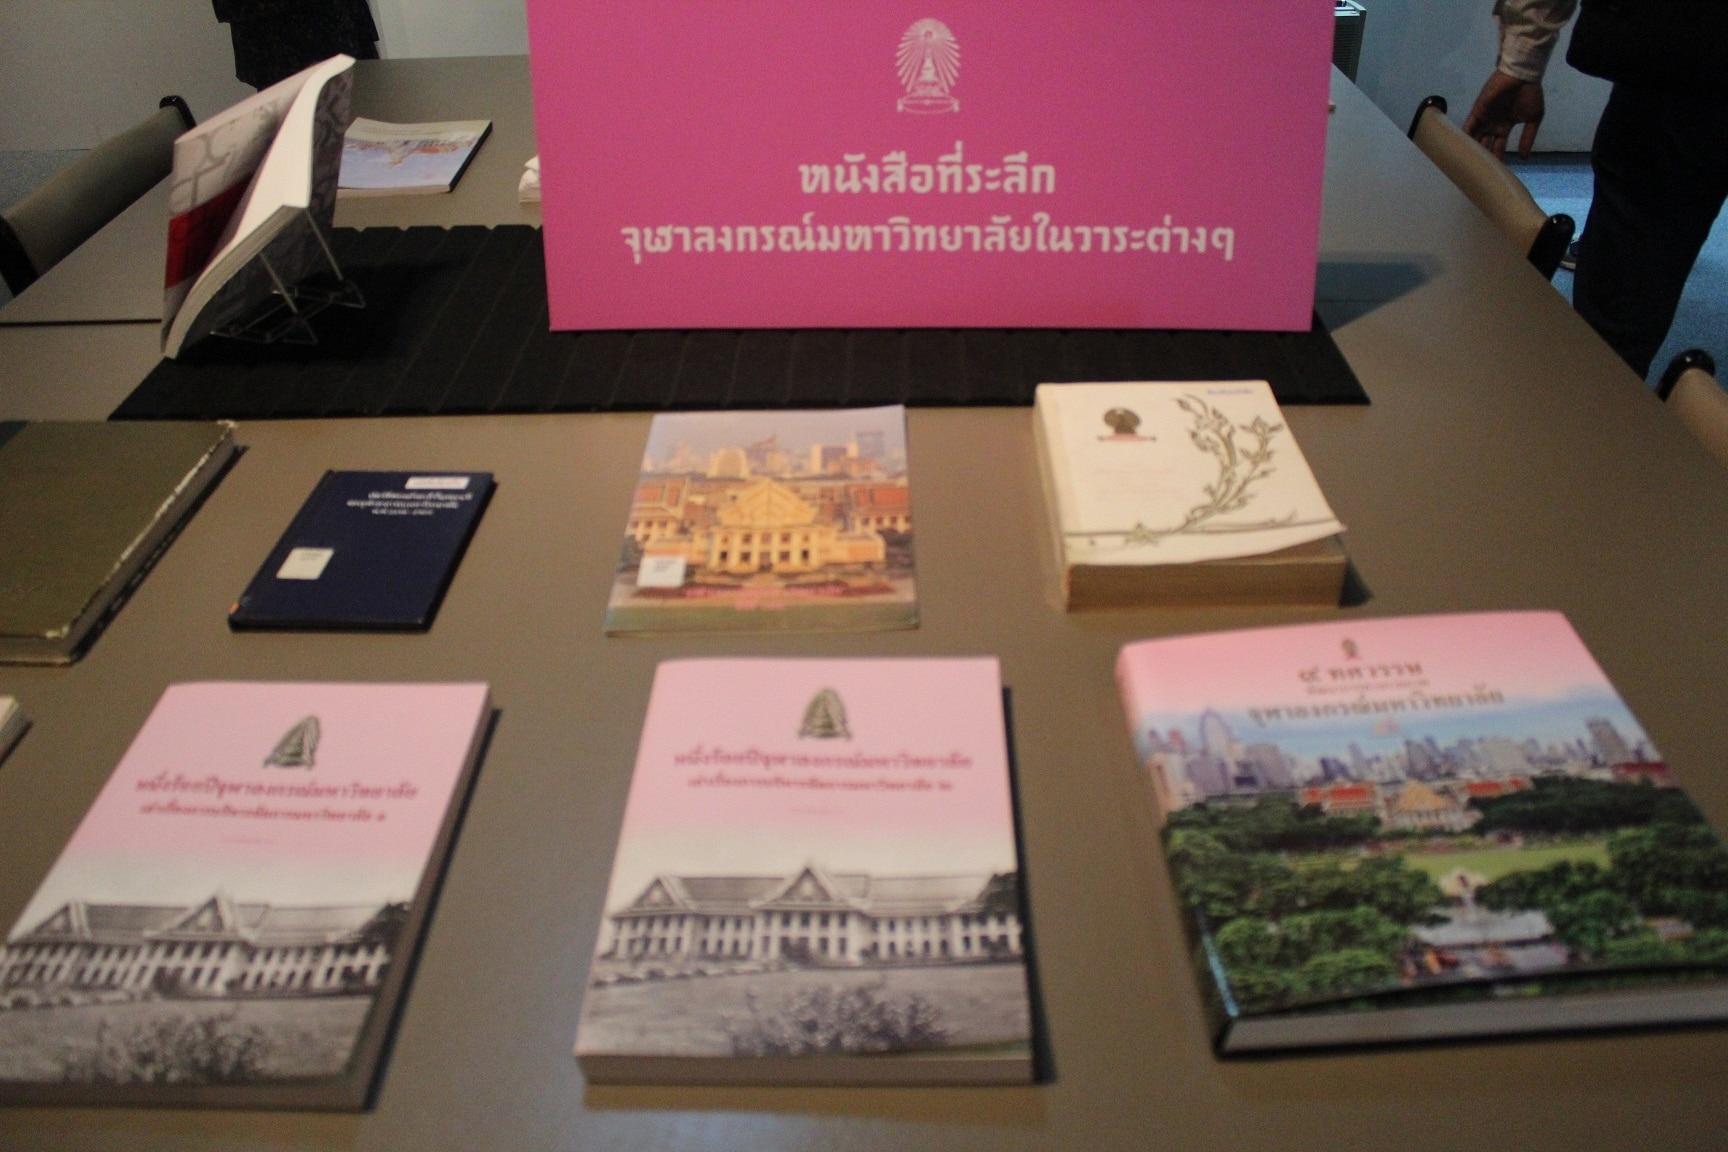 Koleksi King Chulalongkorn